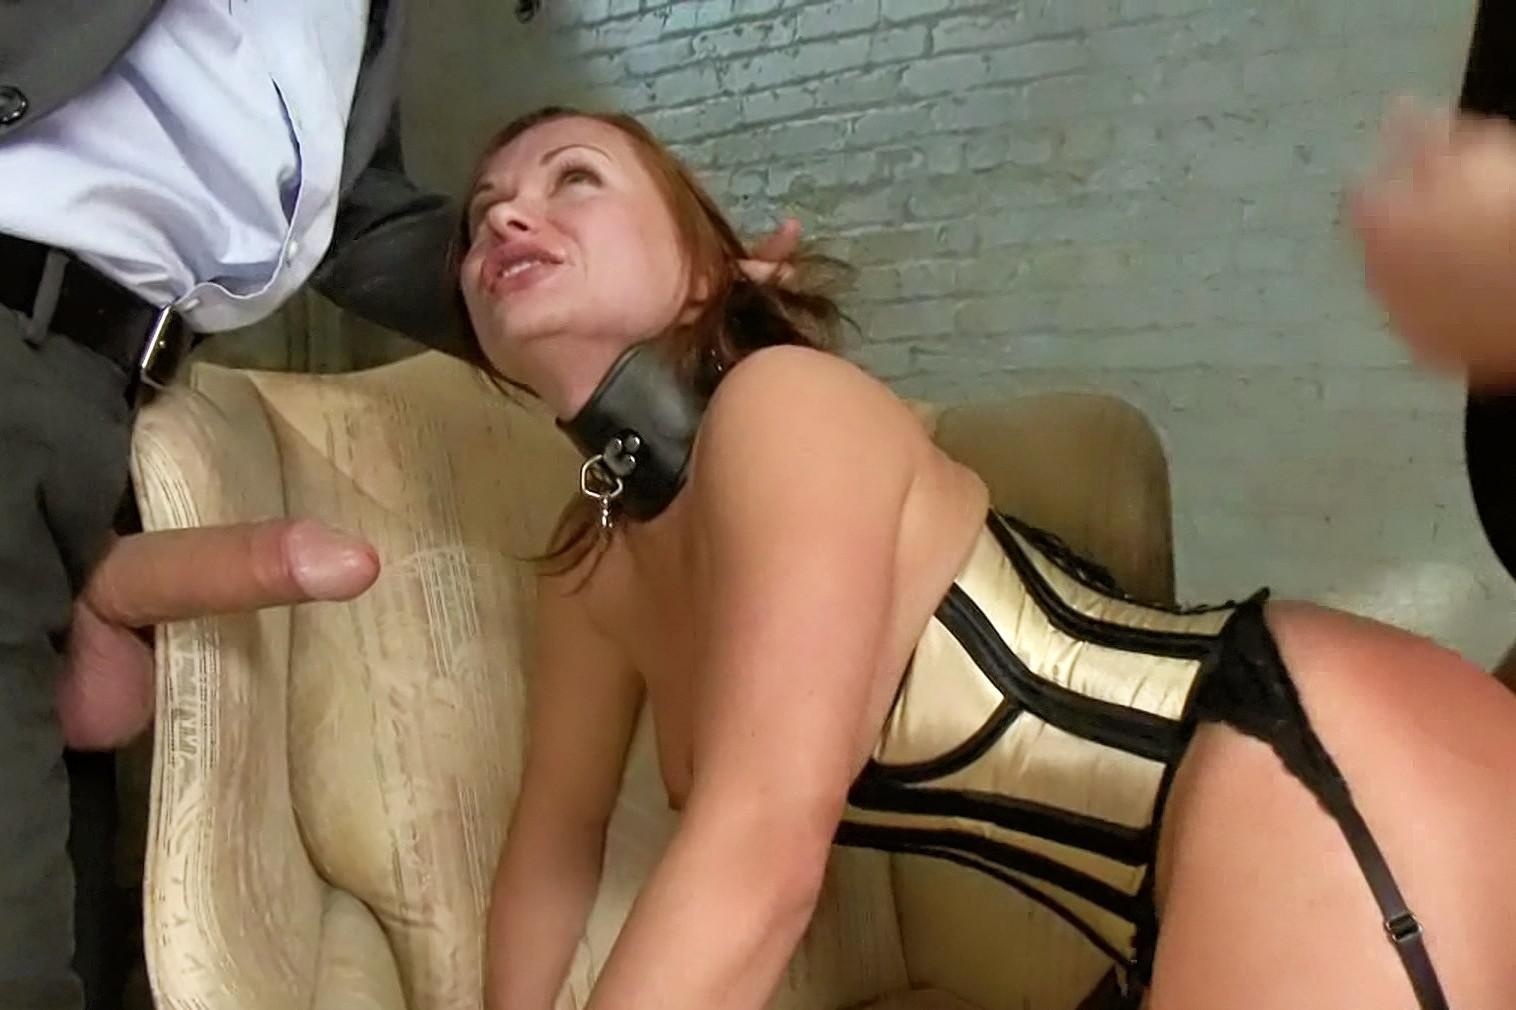 Porn online movies bdsm free